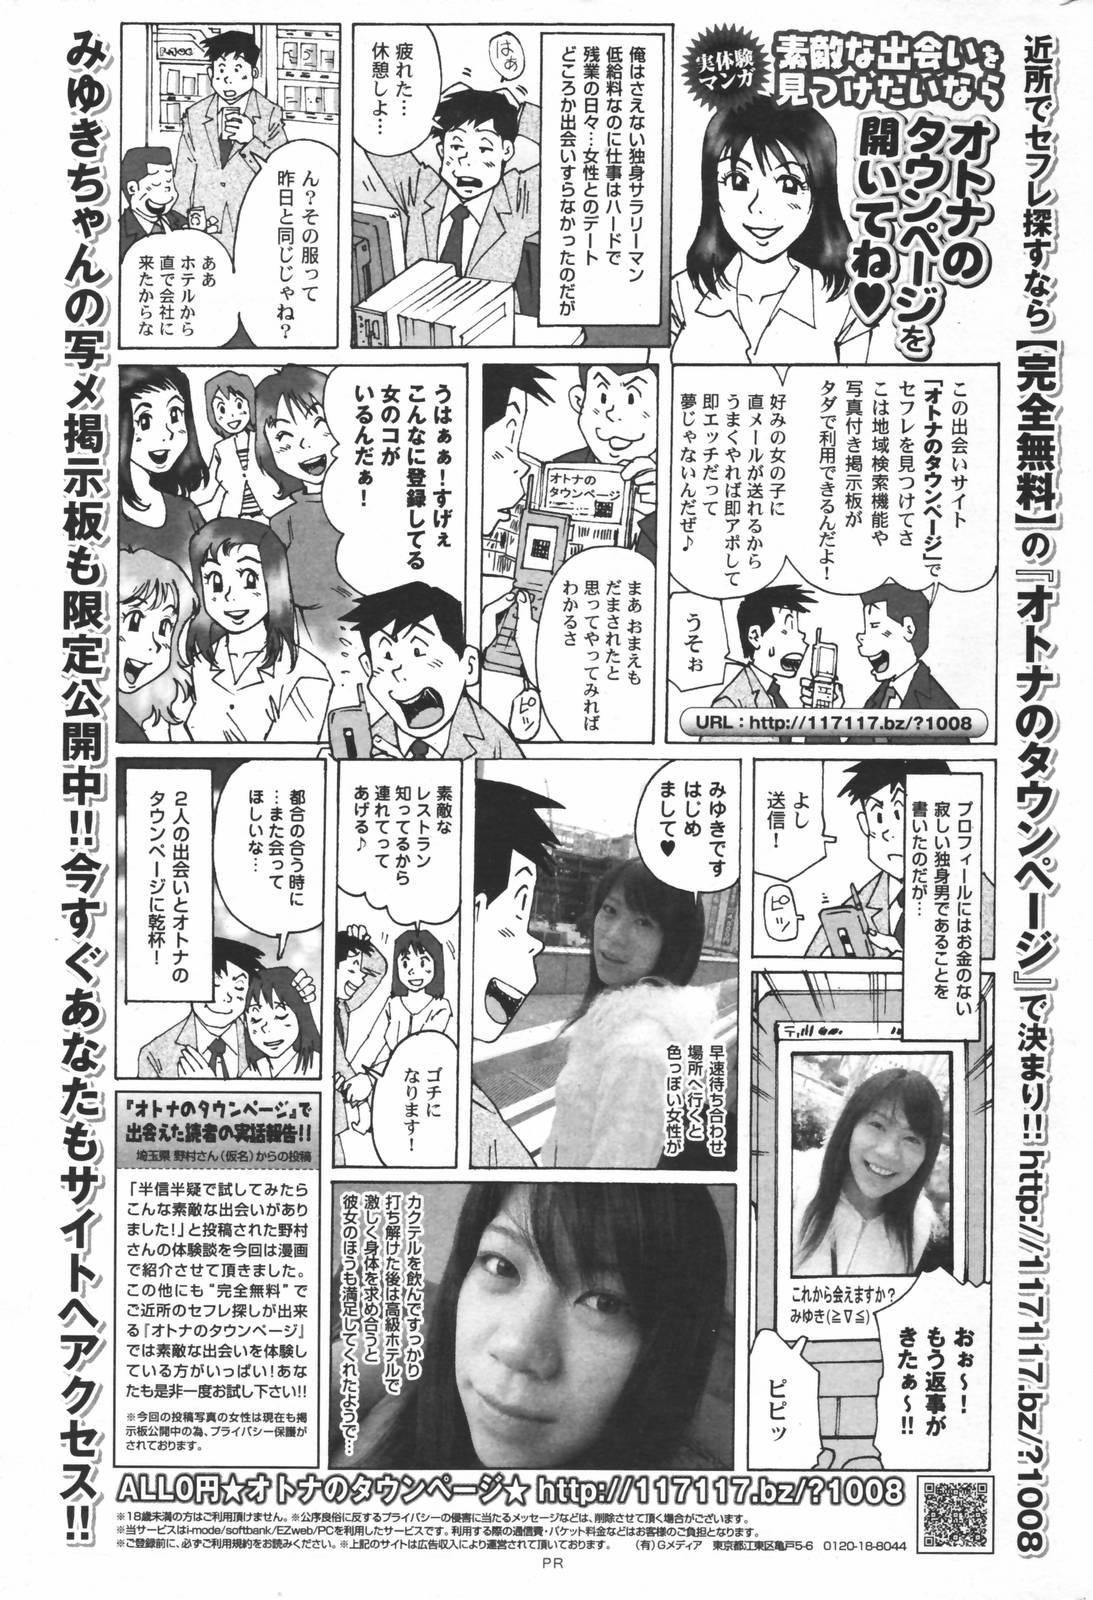 Manga Bangaichi 2007-03 254